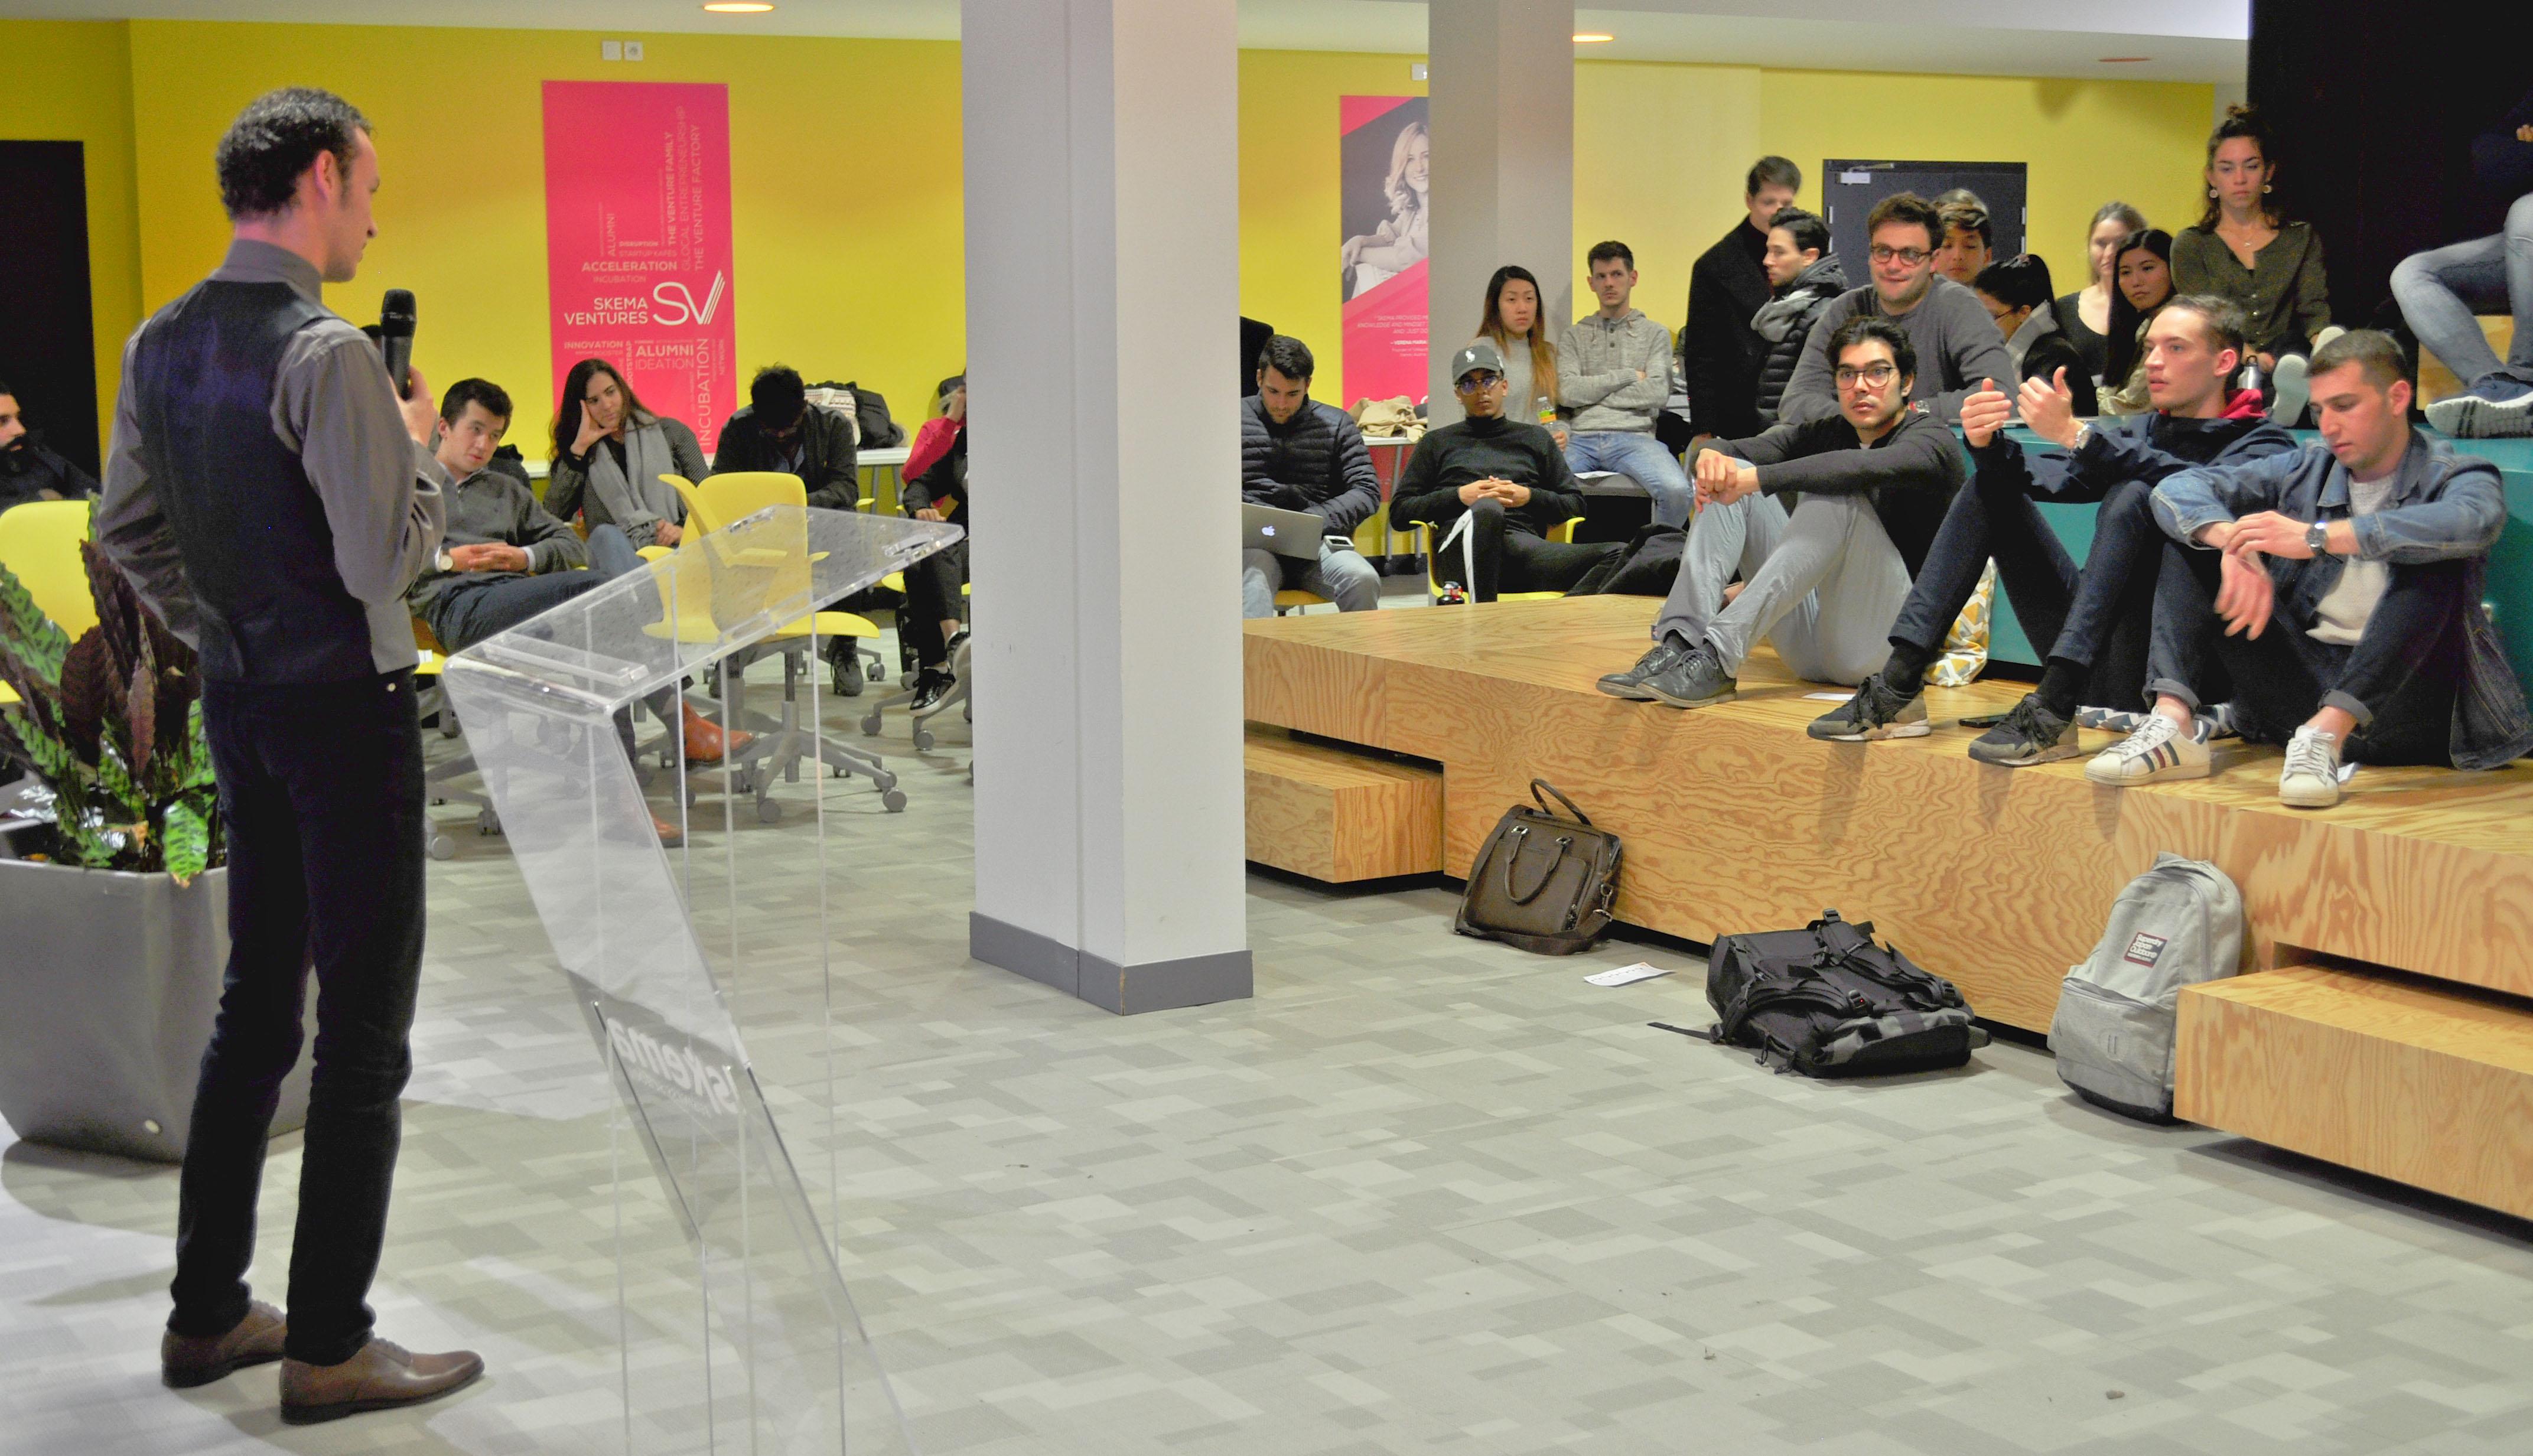 Startup Kafe at Sophia Antipolis campus